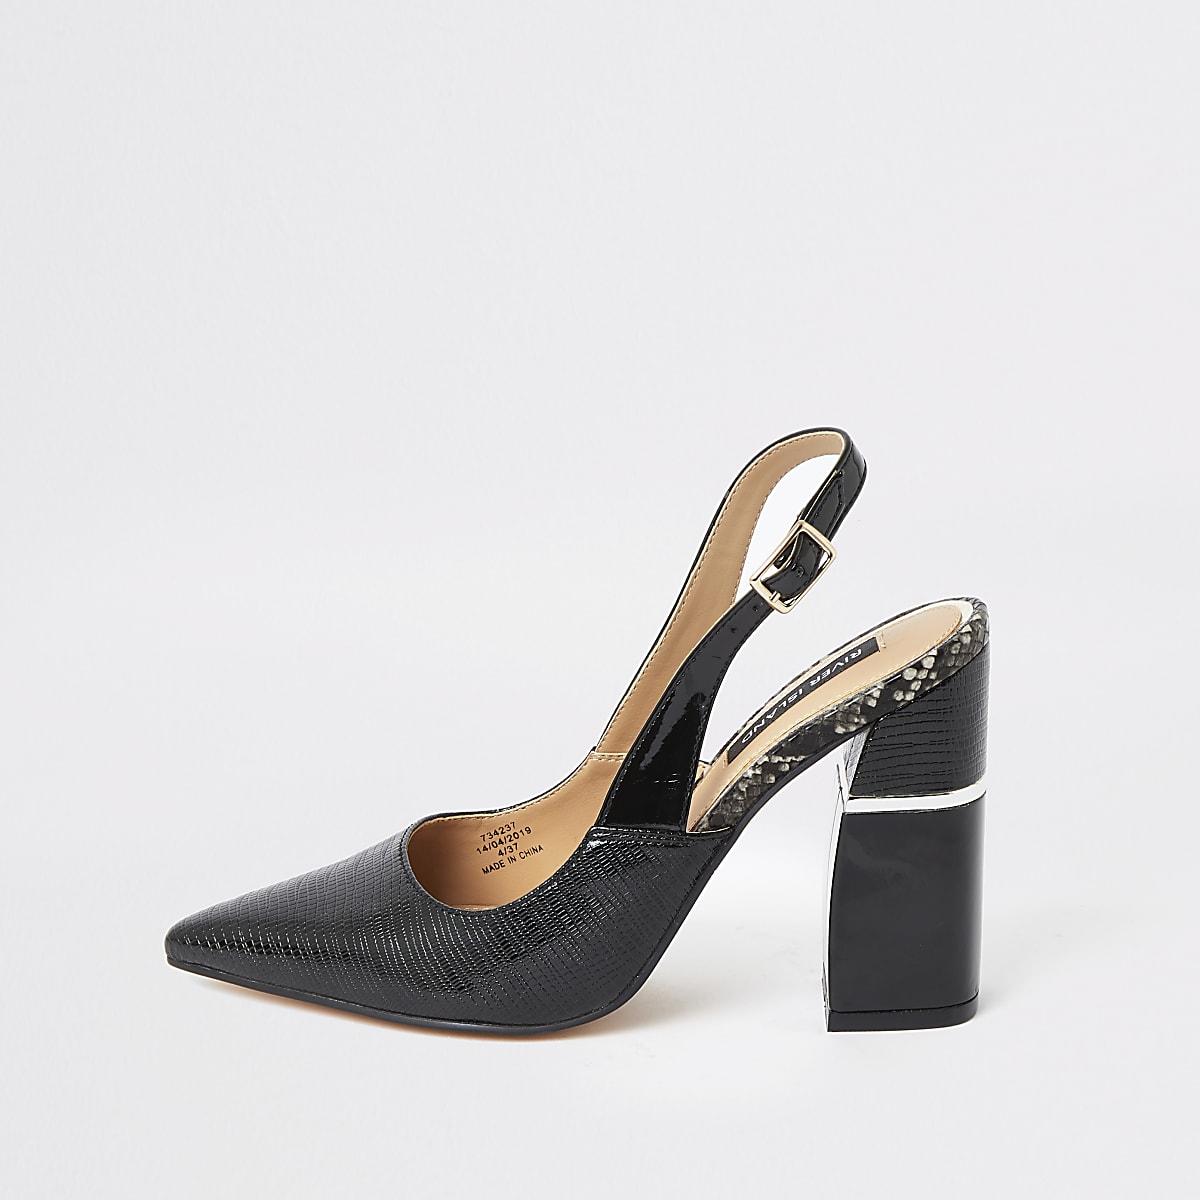 Black slingback block heel court shoes